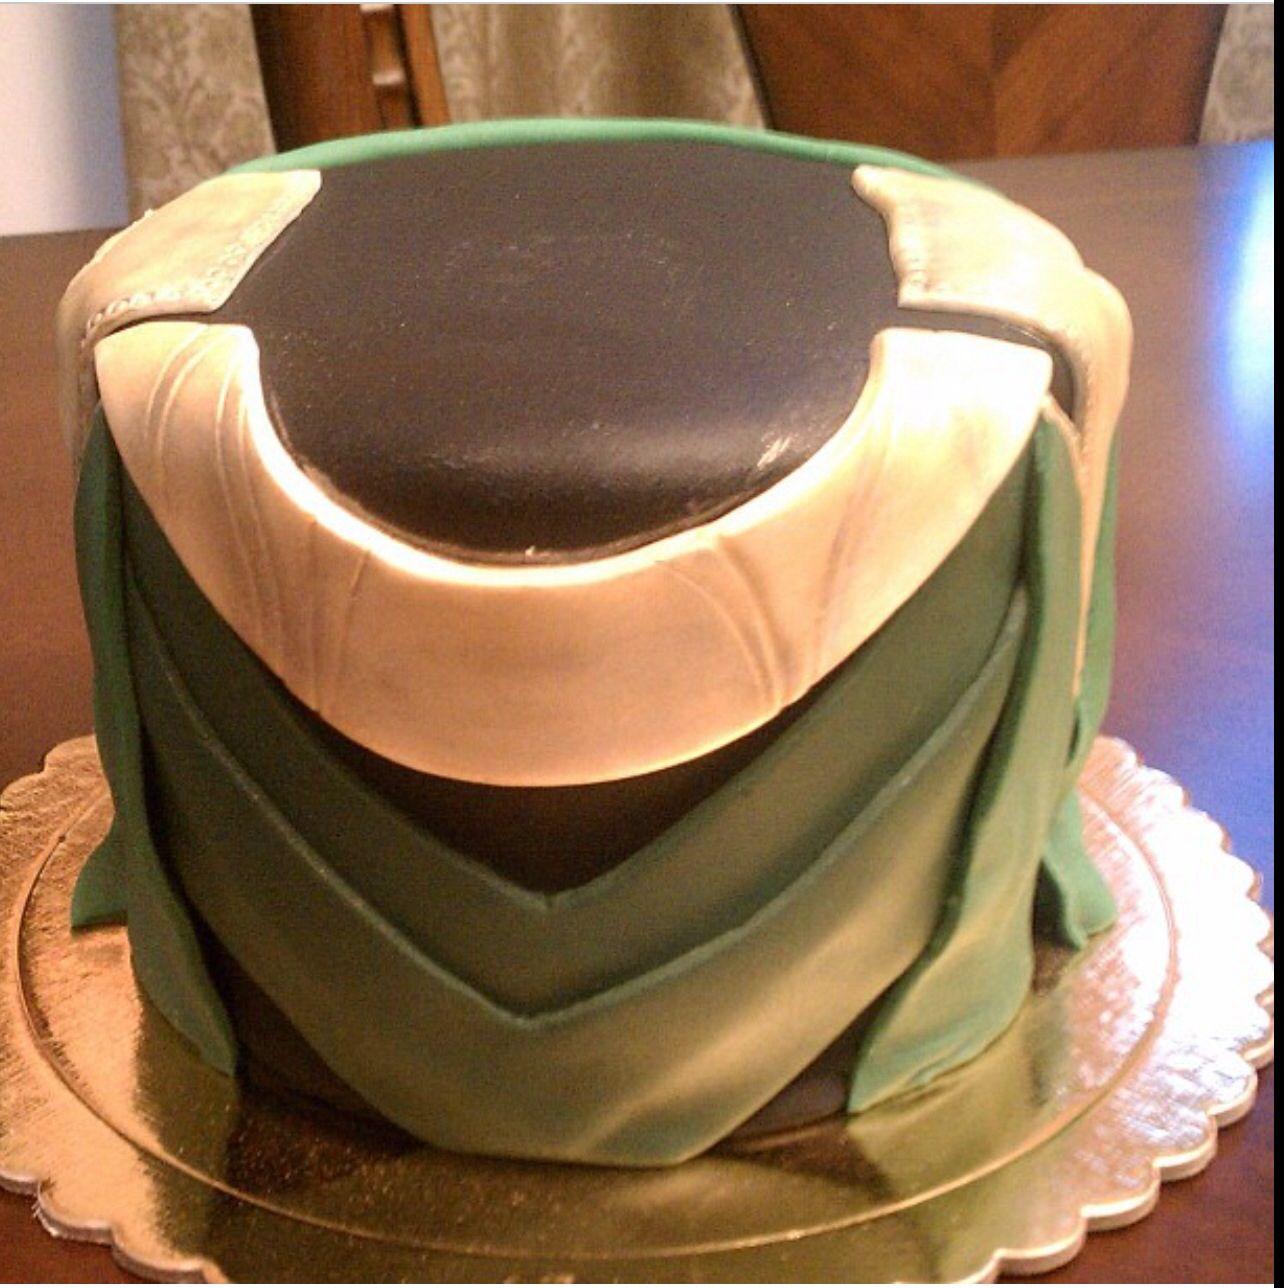 Gead cake option!!! Loki Cake Avengers inspired Fondant cake but the white part gold, with helmet on top.